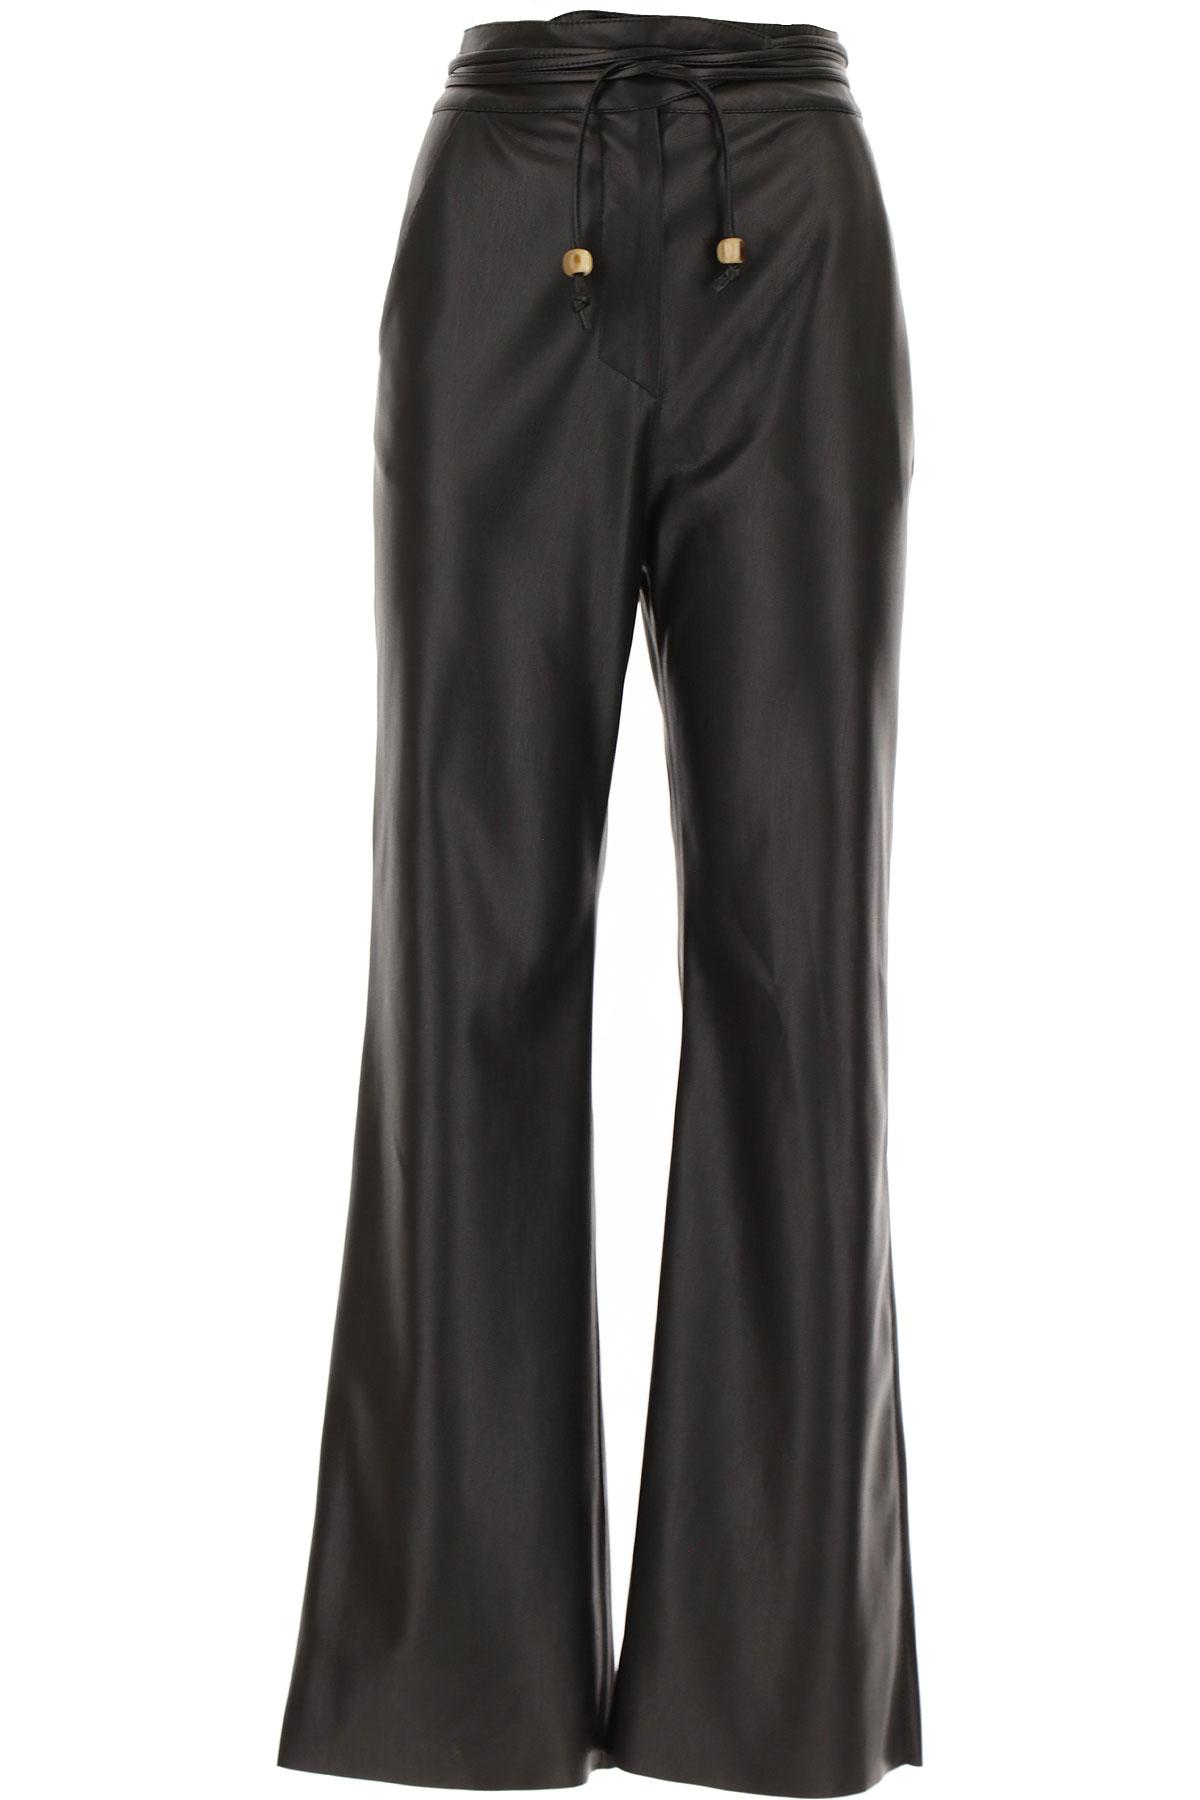 Nanushka Pants for Women On Sale, Black, polyestere, 2019, S (IT 40) M (IT 42 )